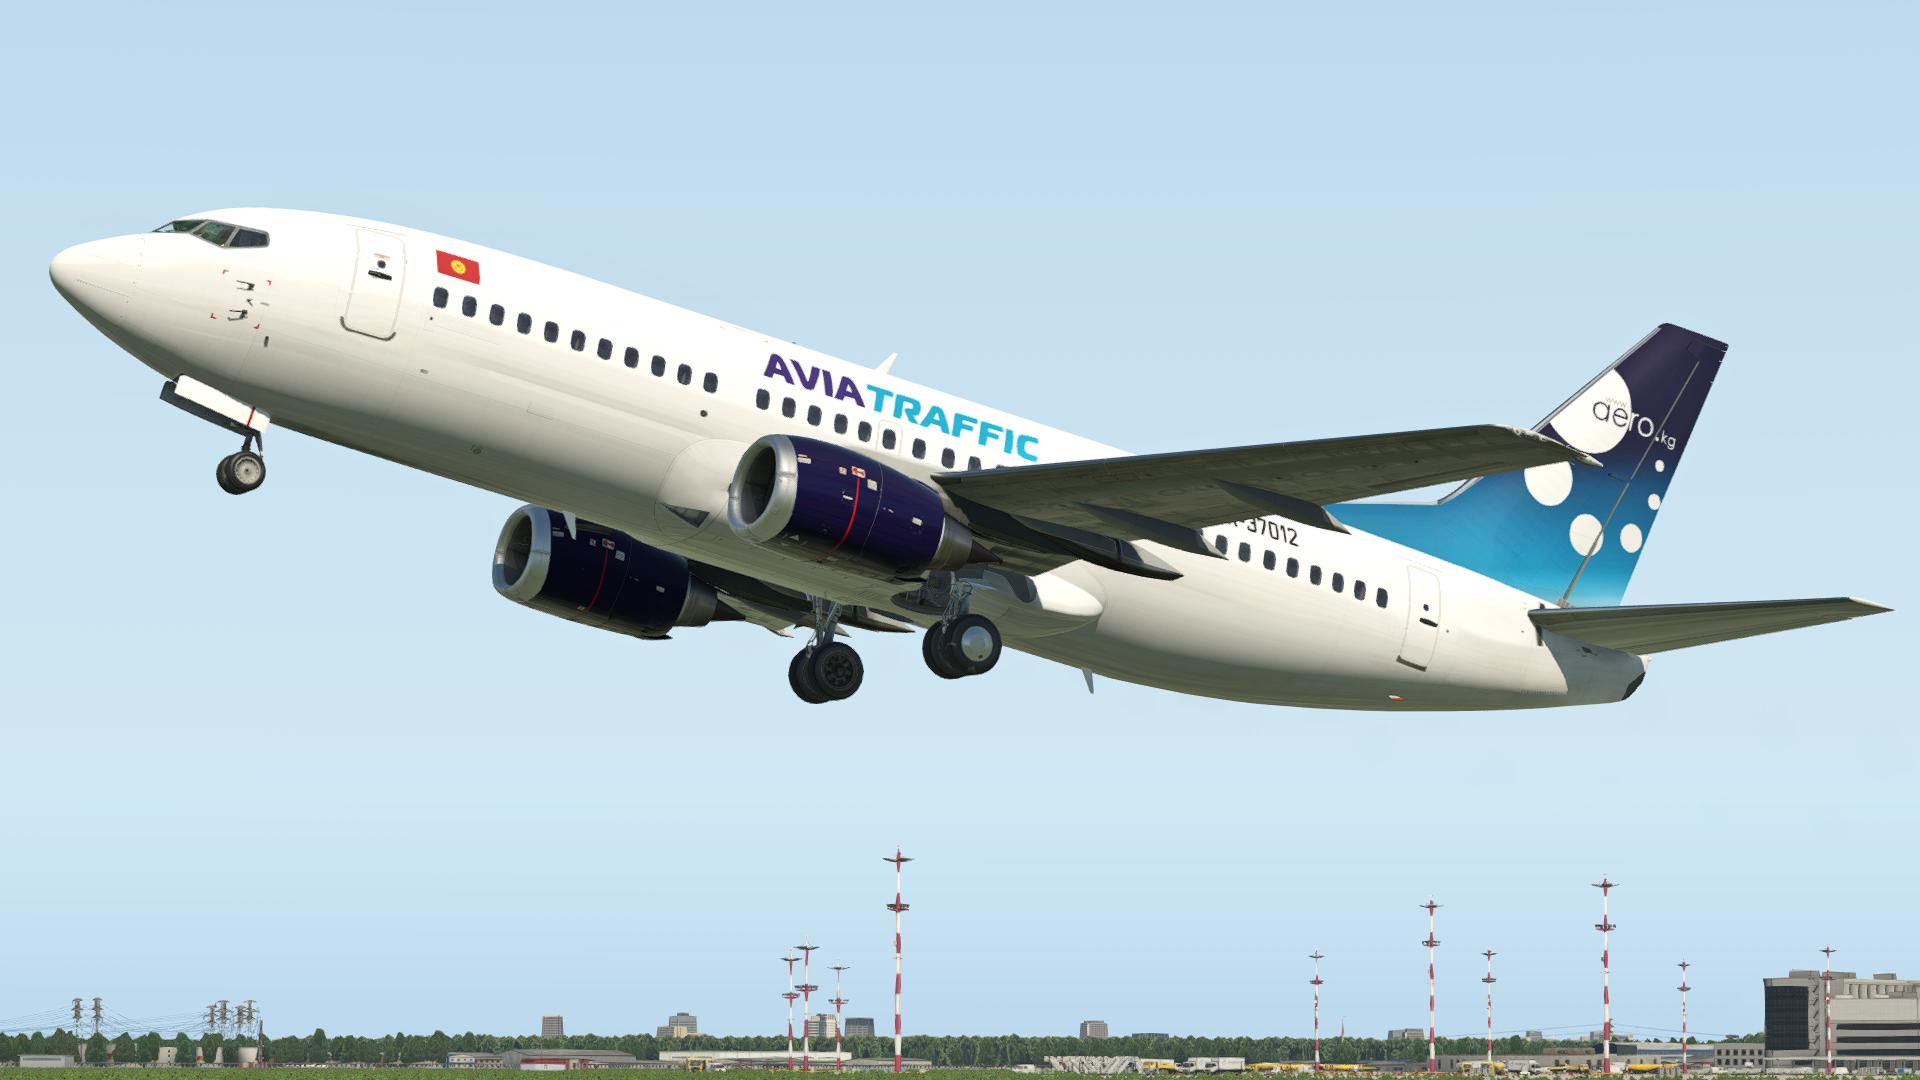 X-Plane_2021-04-04_17-06-28.png